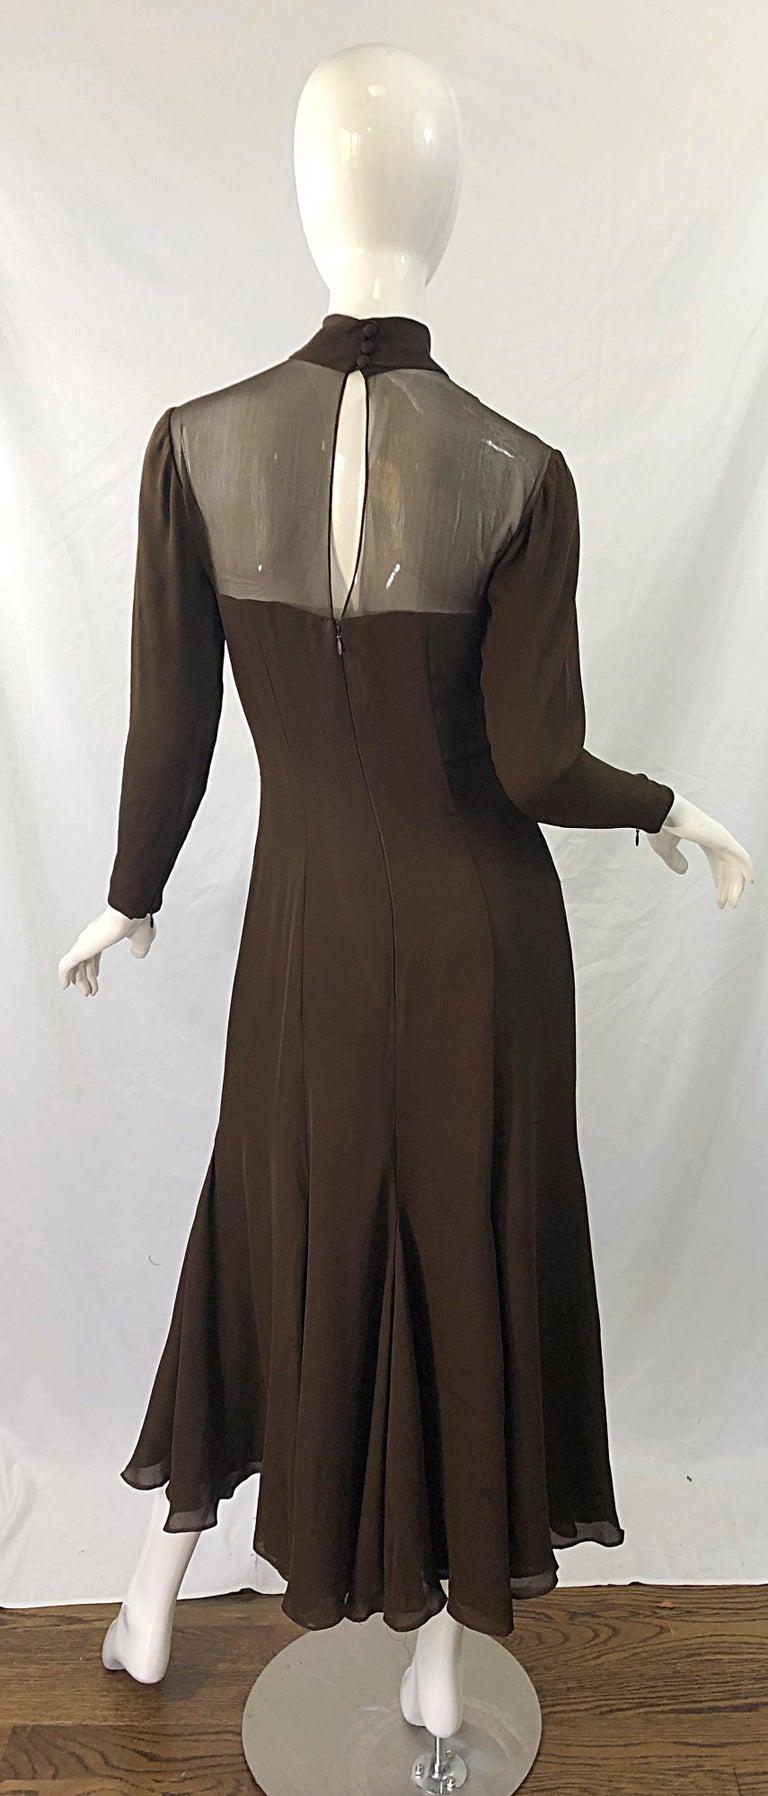 1970s Nolan Miller Couture Chocolate Brown Silk Chiffon Vintage 70s Midi Dress For Sale 9